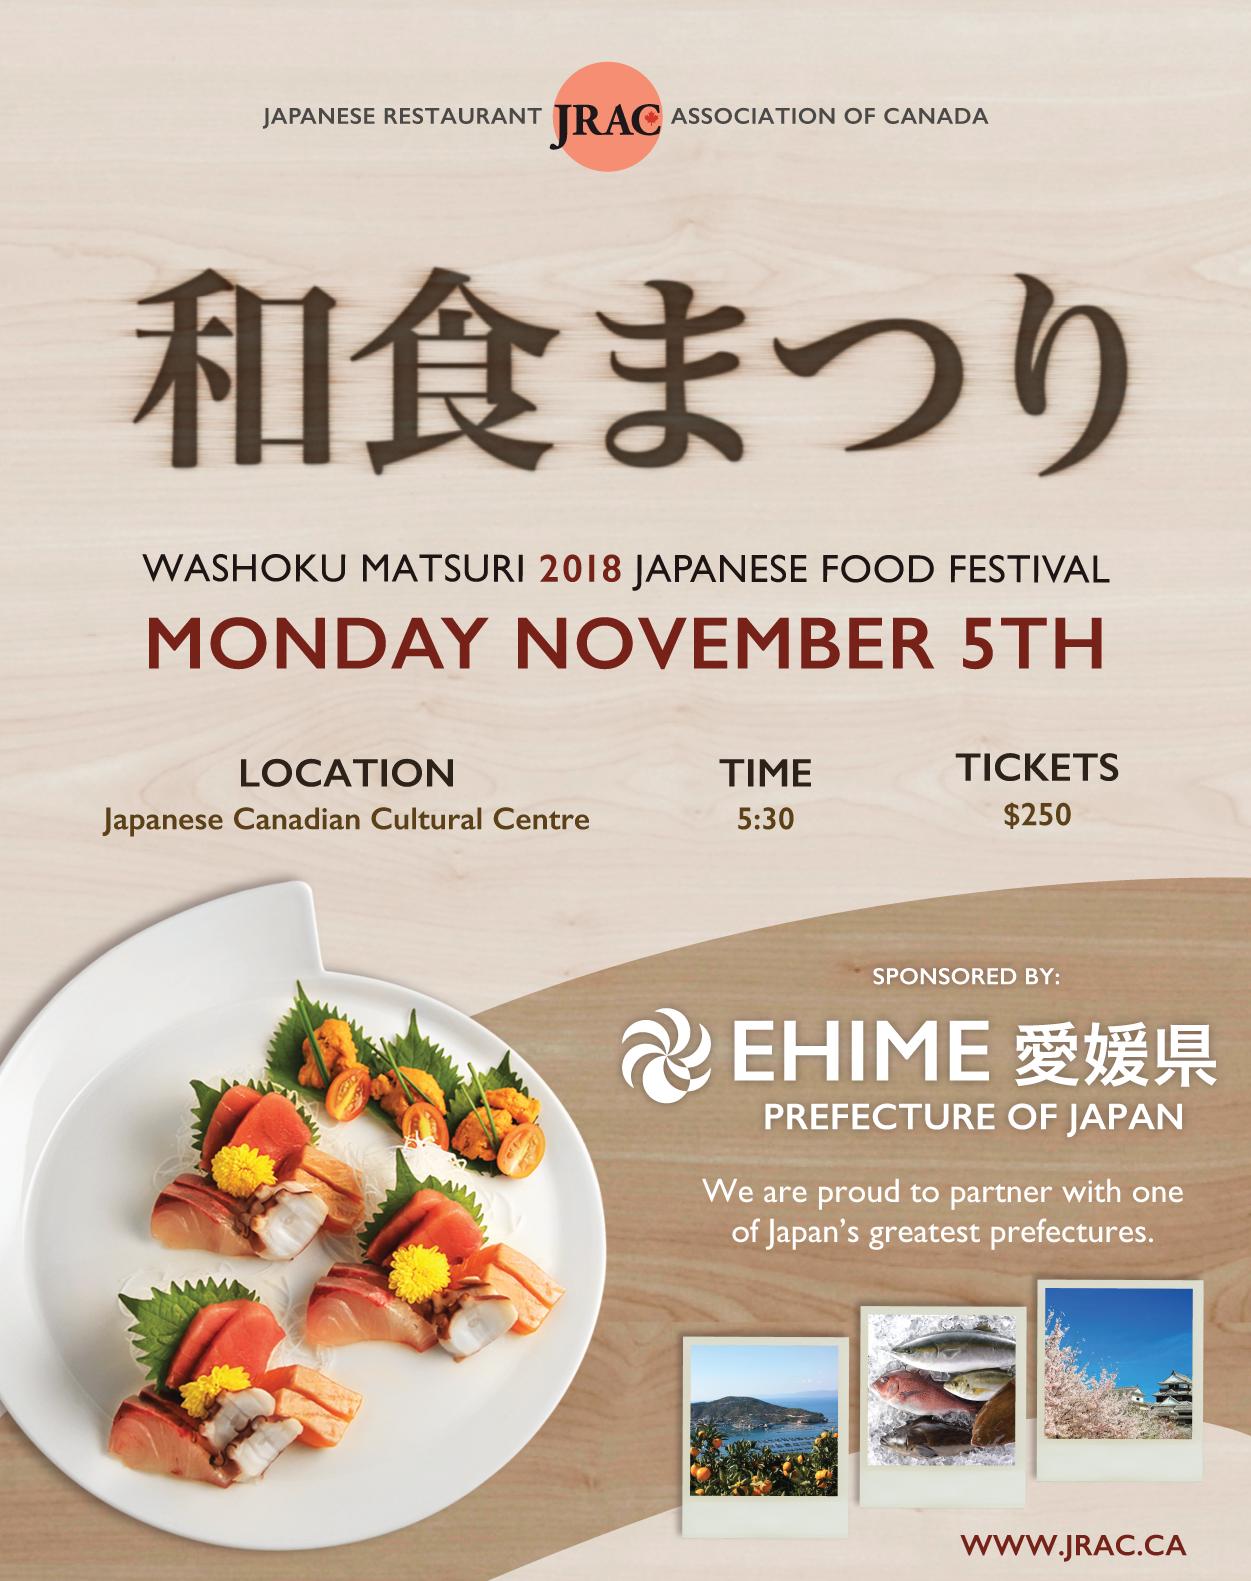 JRAC_Washoku_Web_Poster_v2.png